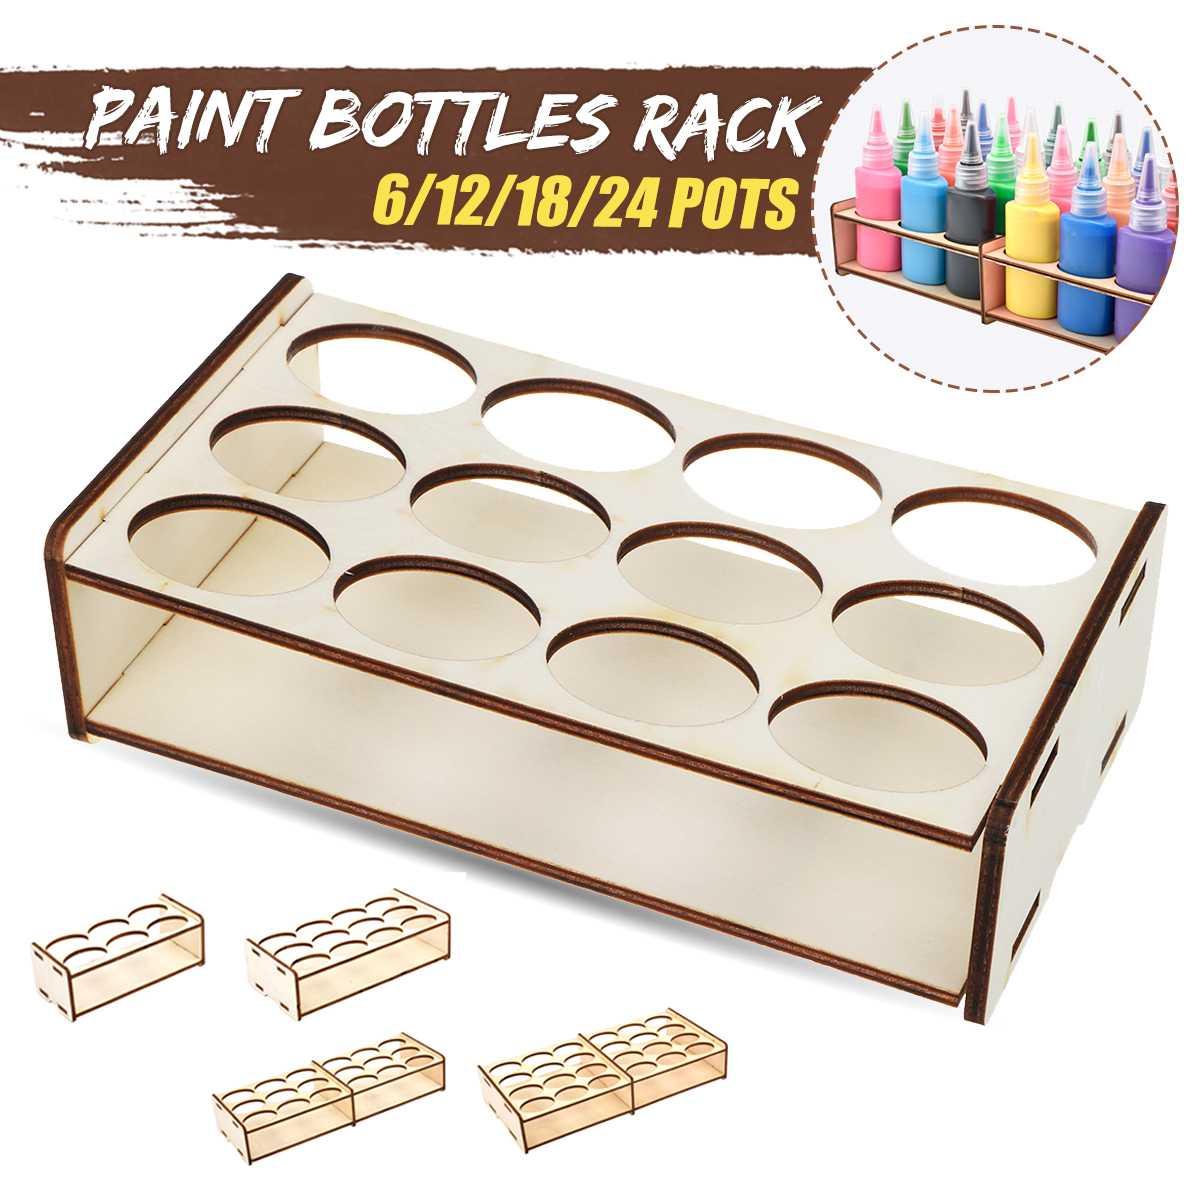 Suporte organizador para artesanato, equipamento e organizador para armazenamento de 6/12/2020 potes, pigmento de madeira, garrafa, novo, 18/24